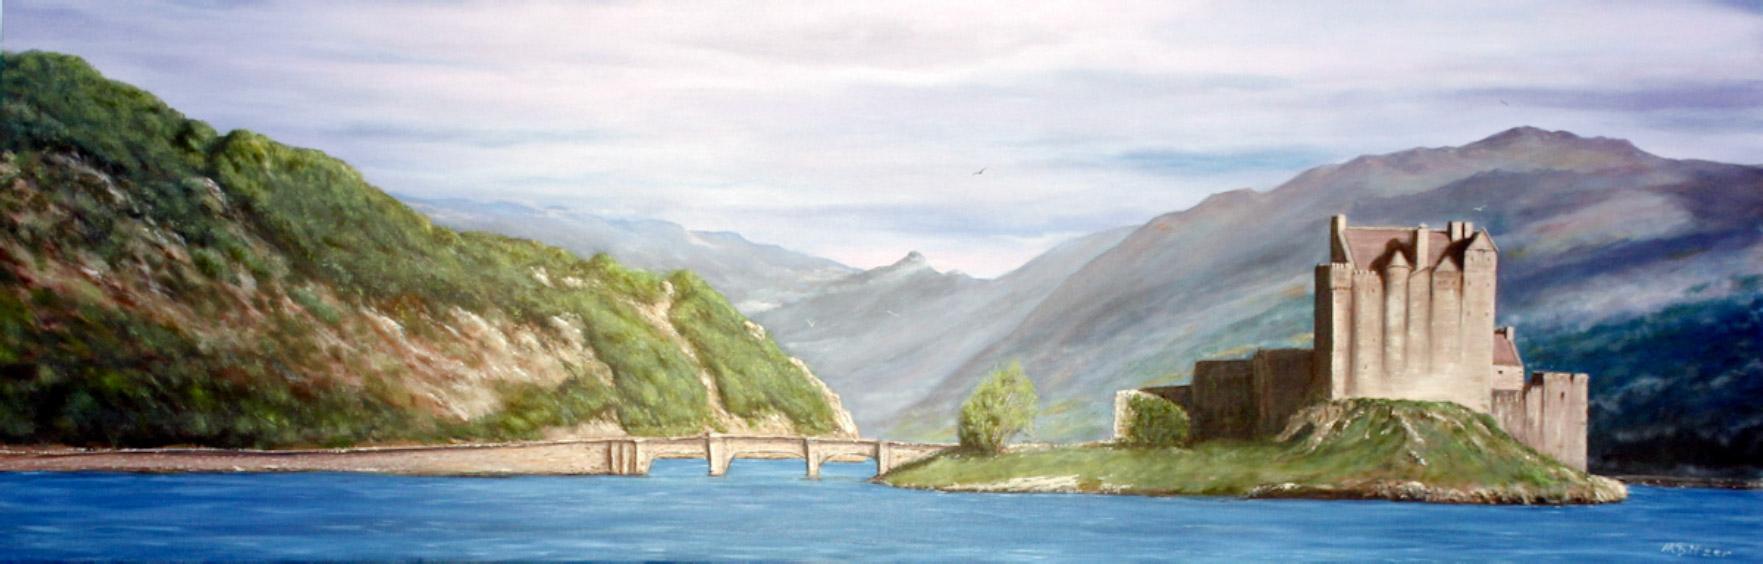 Eileen Donan Castle Highlands / Scotland, 40 x 120 cm, Oil on canvas